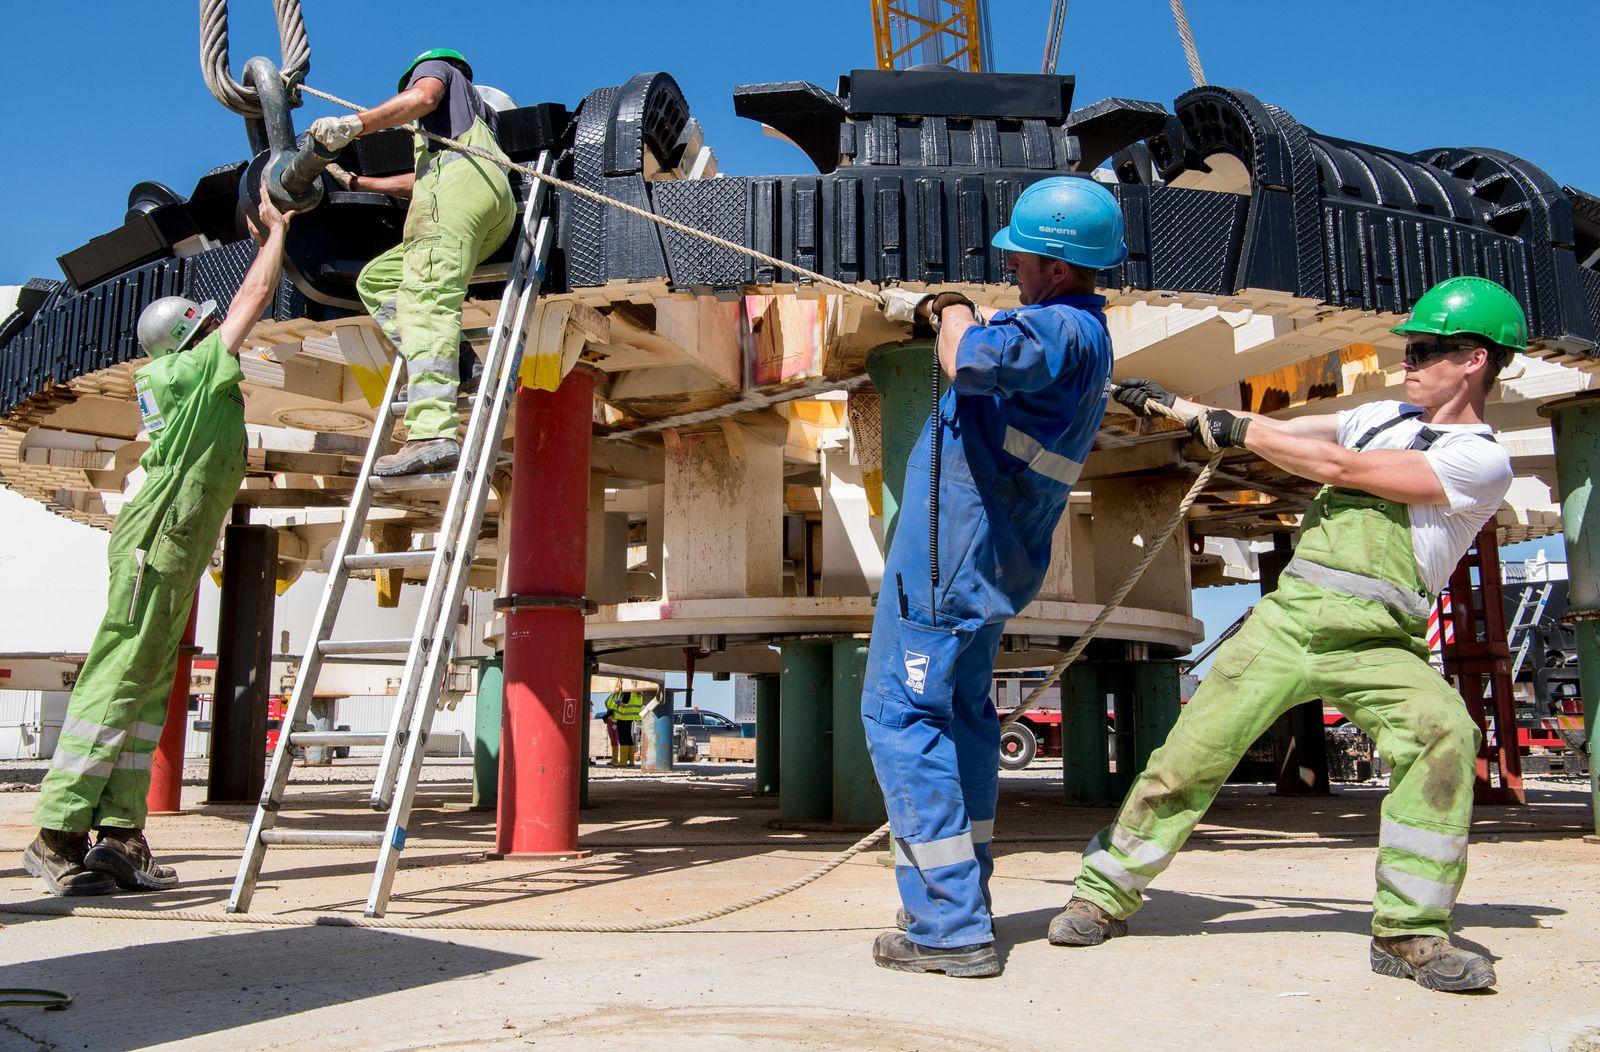 Baustelle/ Arbeiter